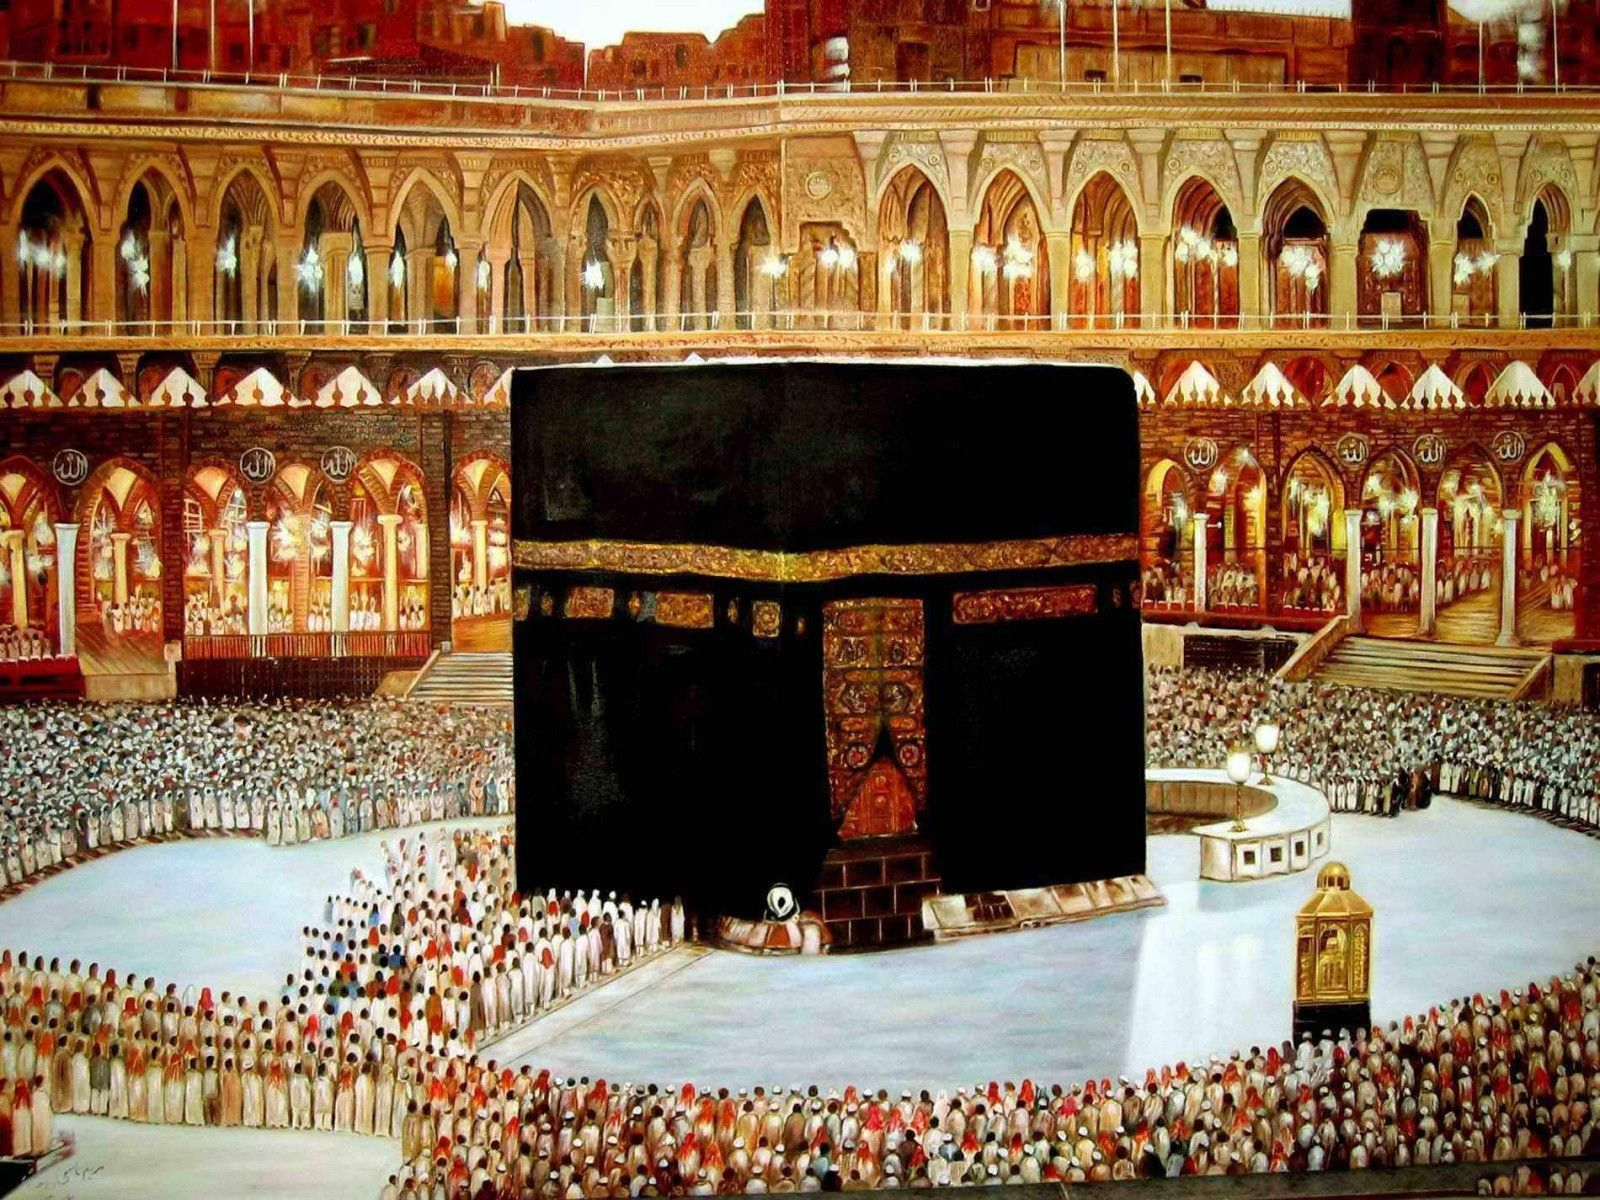 Mecca Sharif Wallpapers Hd Wallpaperswindows 8 Hq Wallpapers